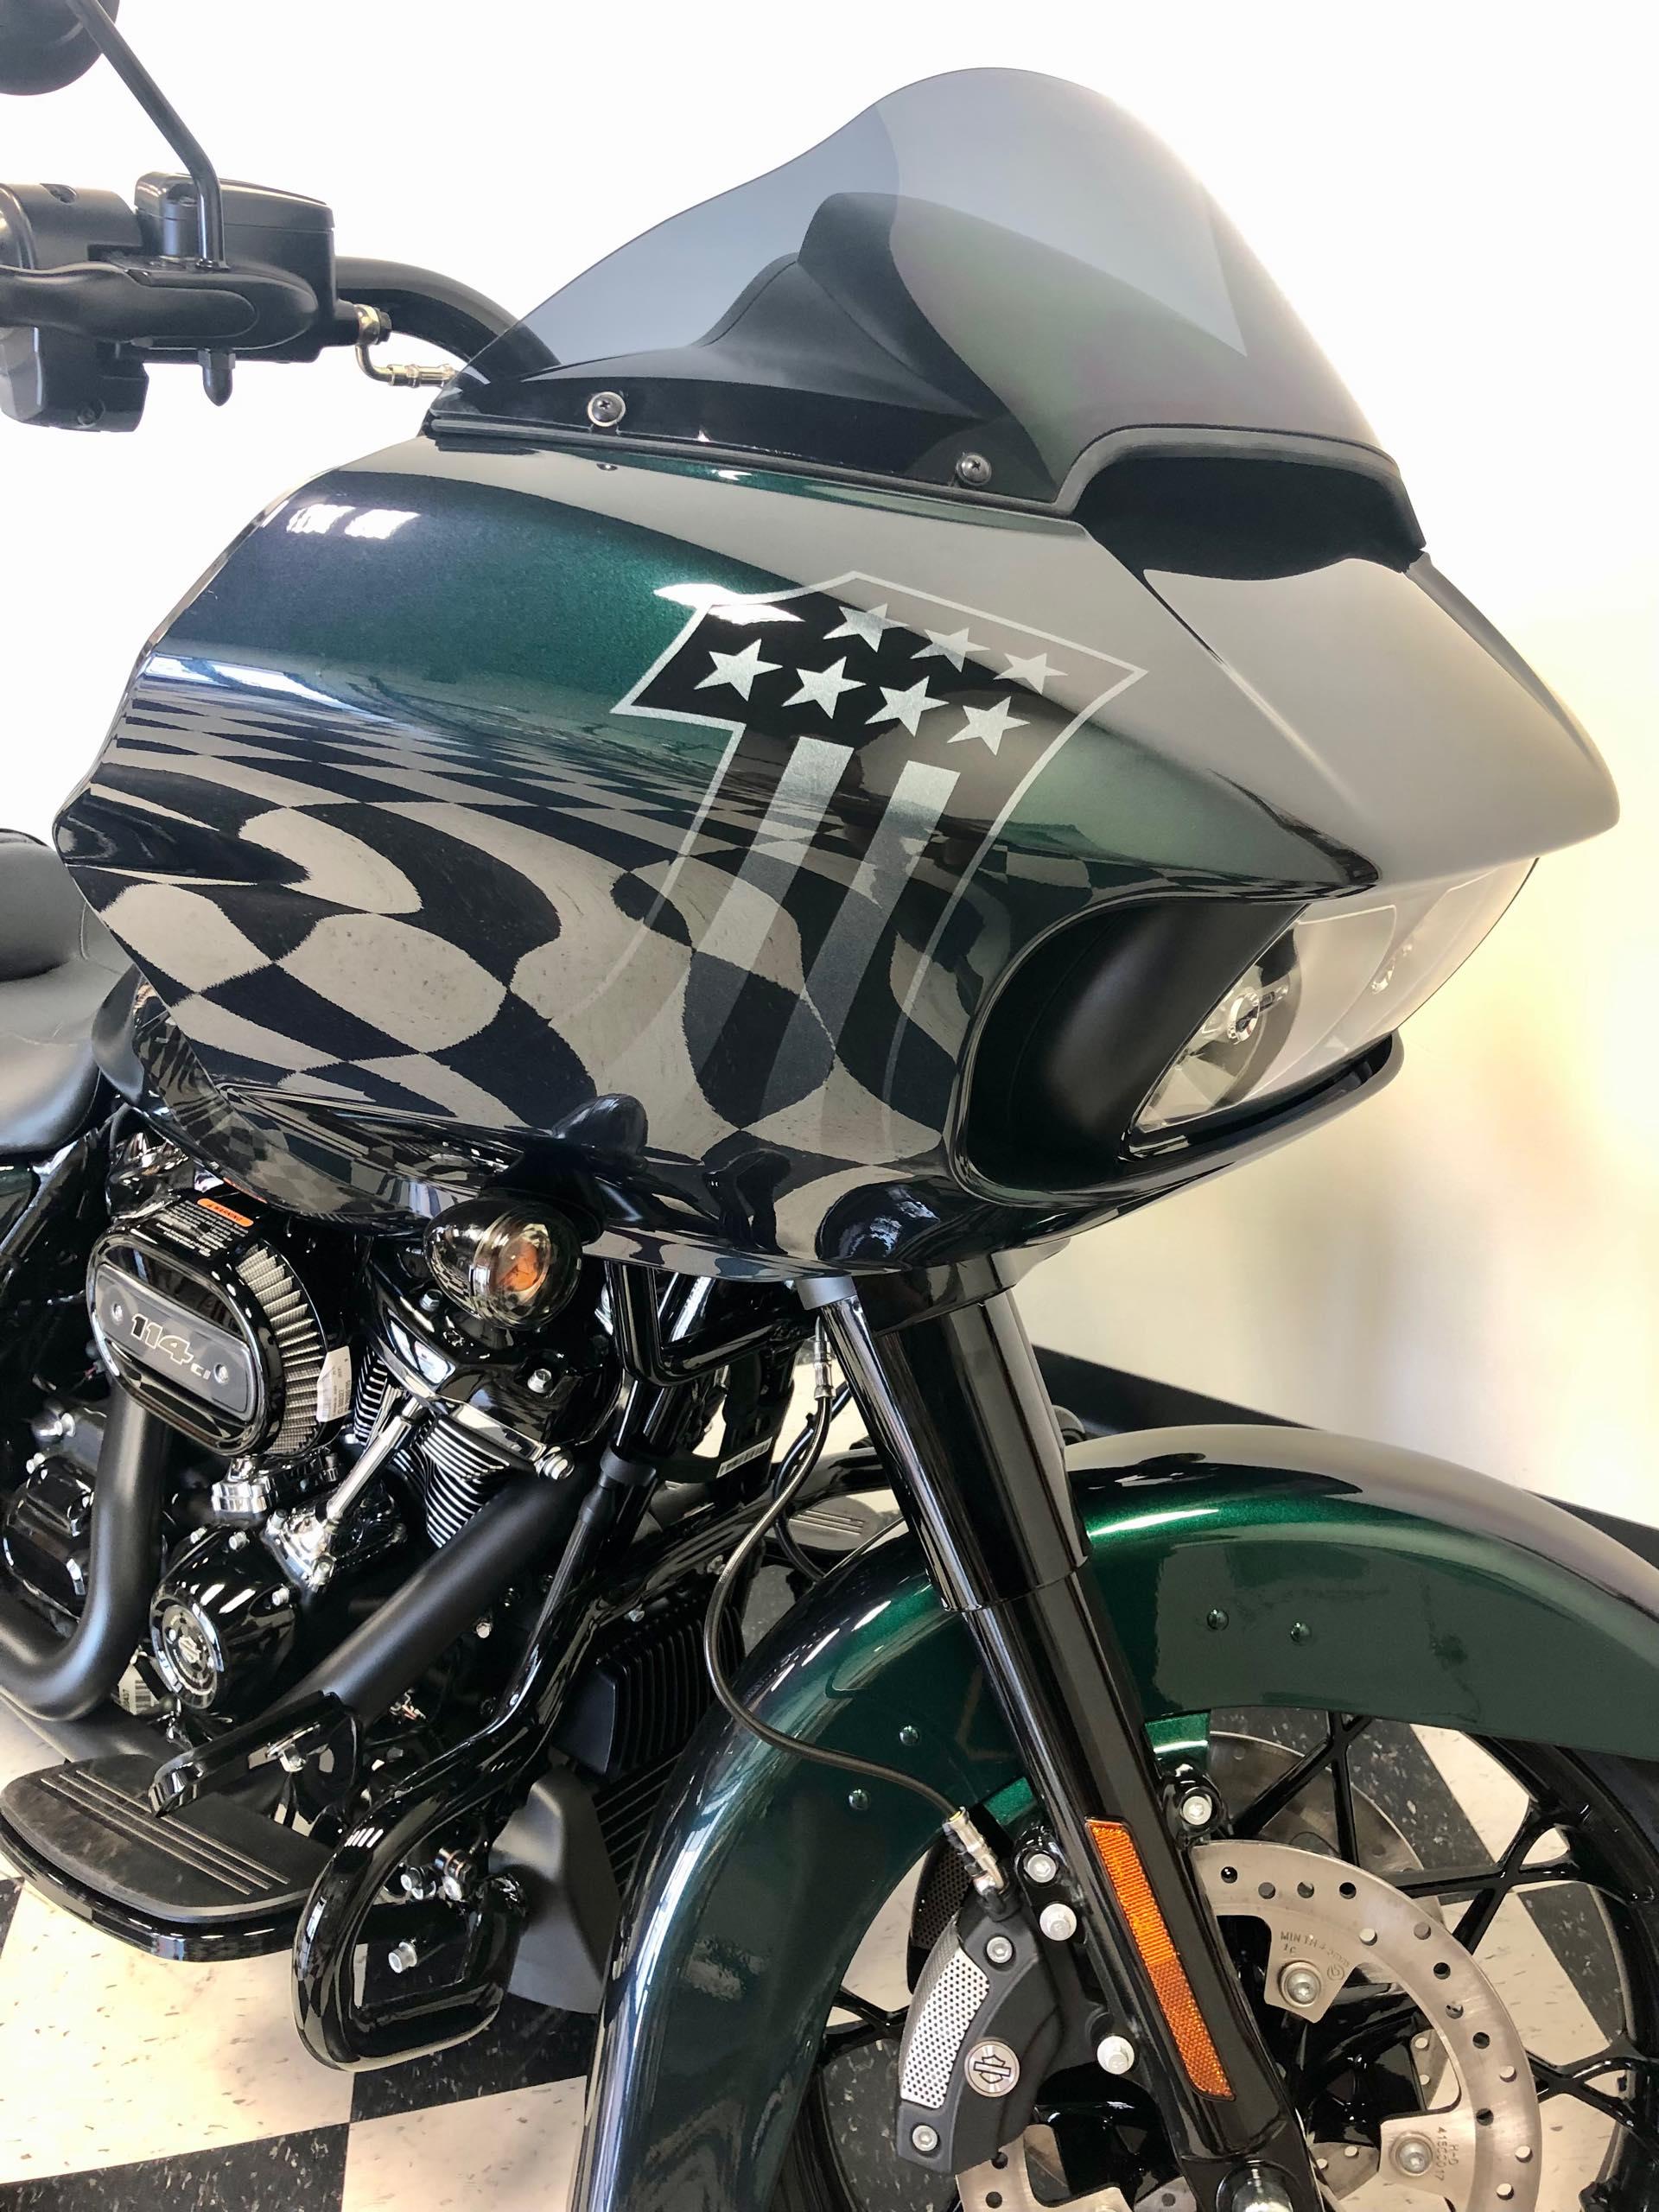 2021 Harley-Davidson Touring Road Glide Special at Deluxe Harley Davidson